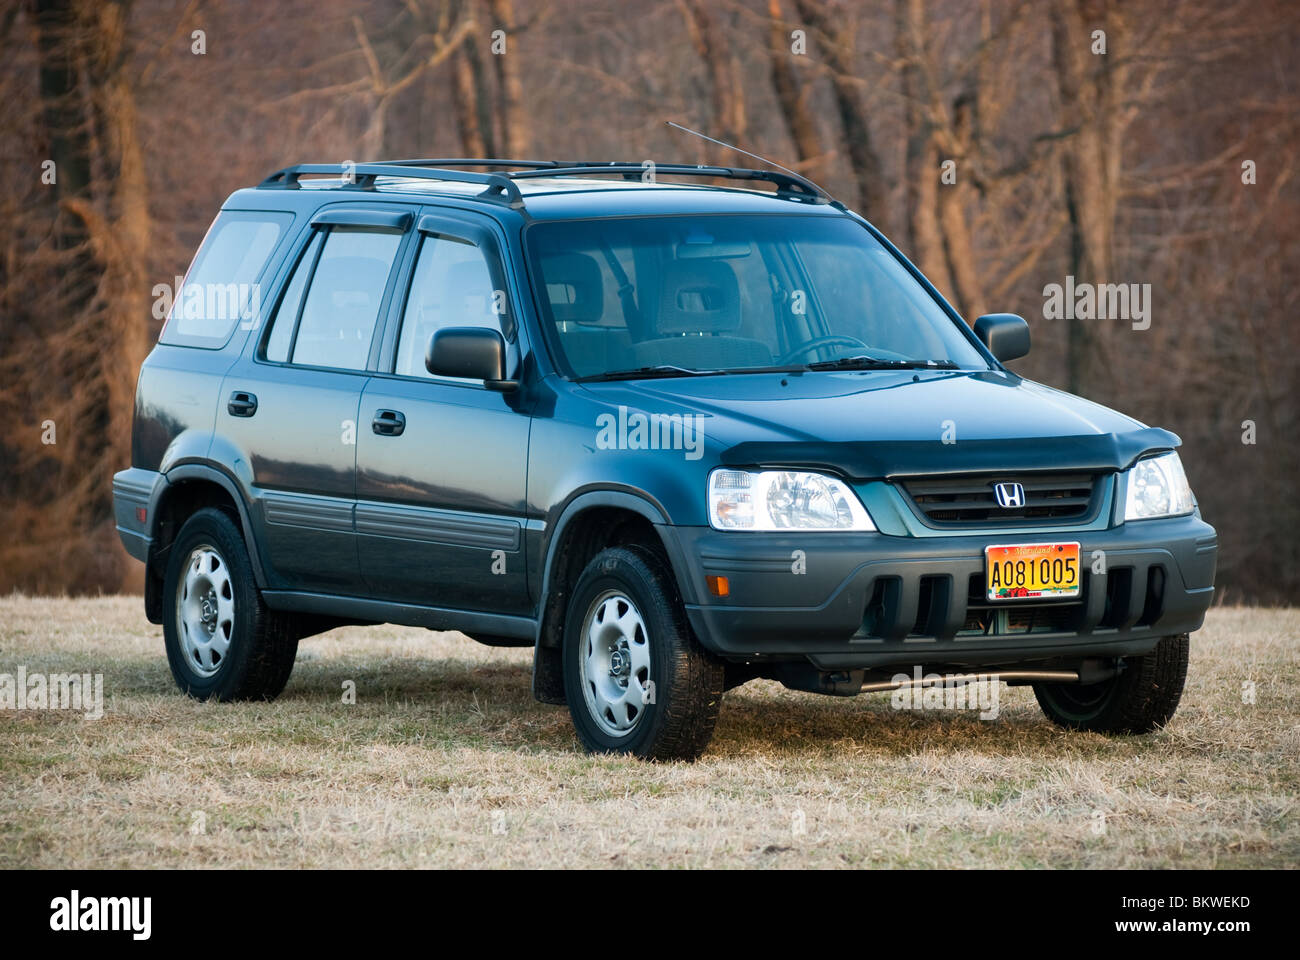 Honda Crv 1998 >> 1998 Honda CRV Stock Photo, Royalty Free Image: 29449153 - Alamy